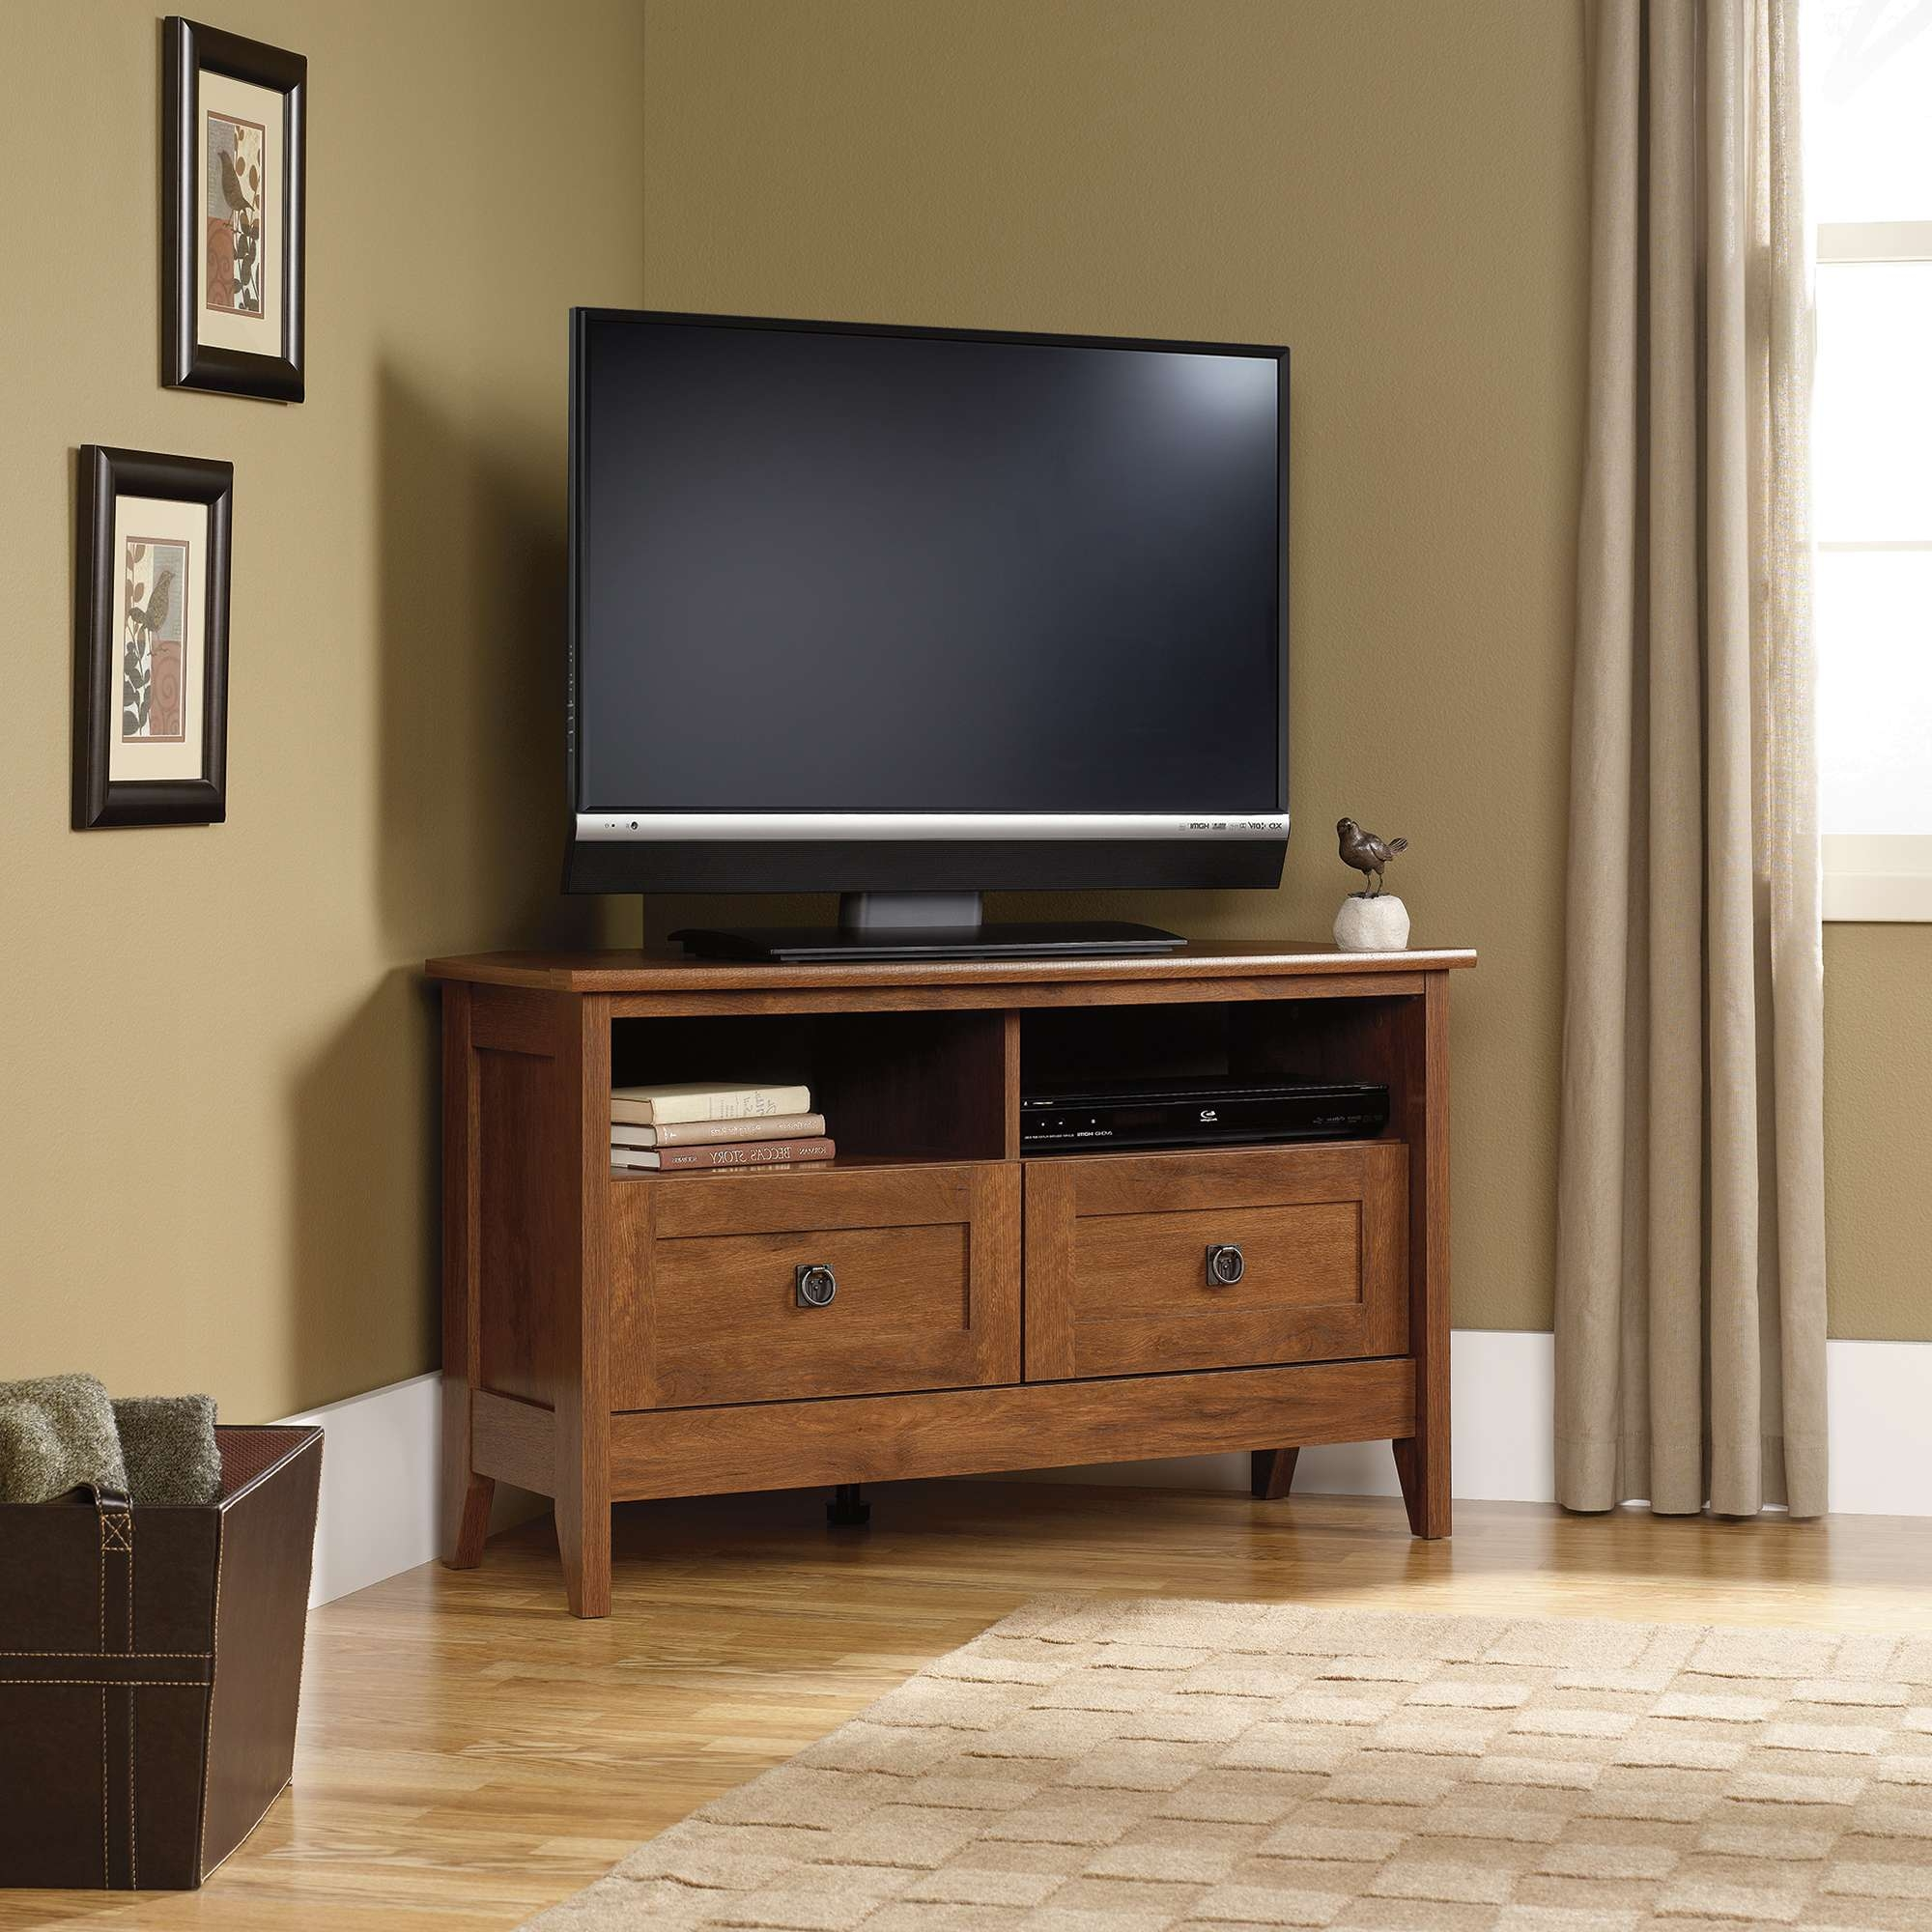 Sauder Select   Corner Tv Stand   410627   Sauder Regarding Cornet Tv Stands (View 14 of 15)